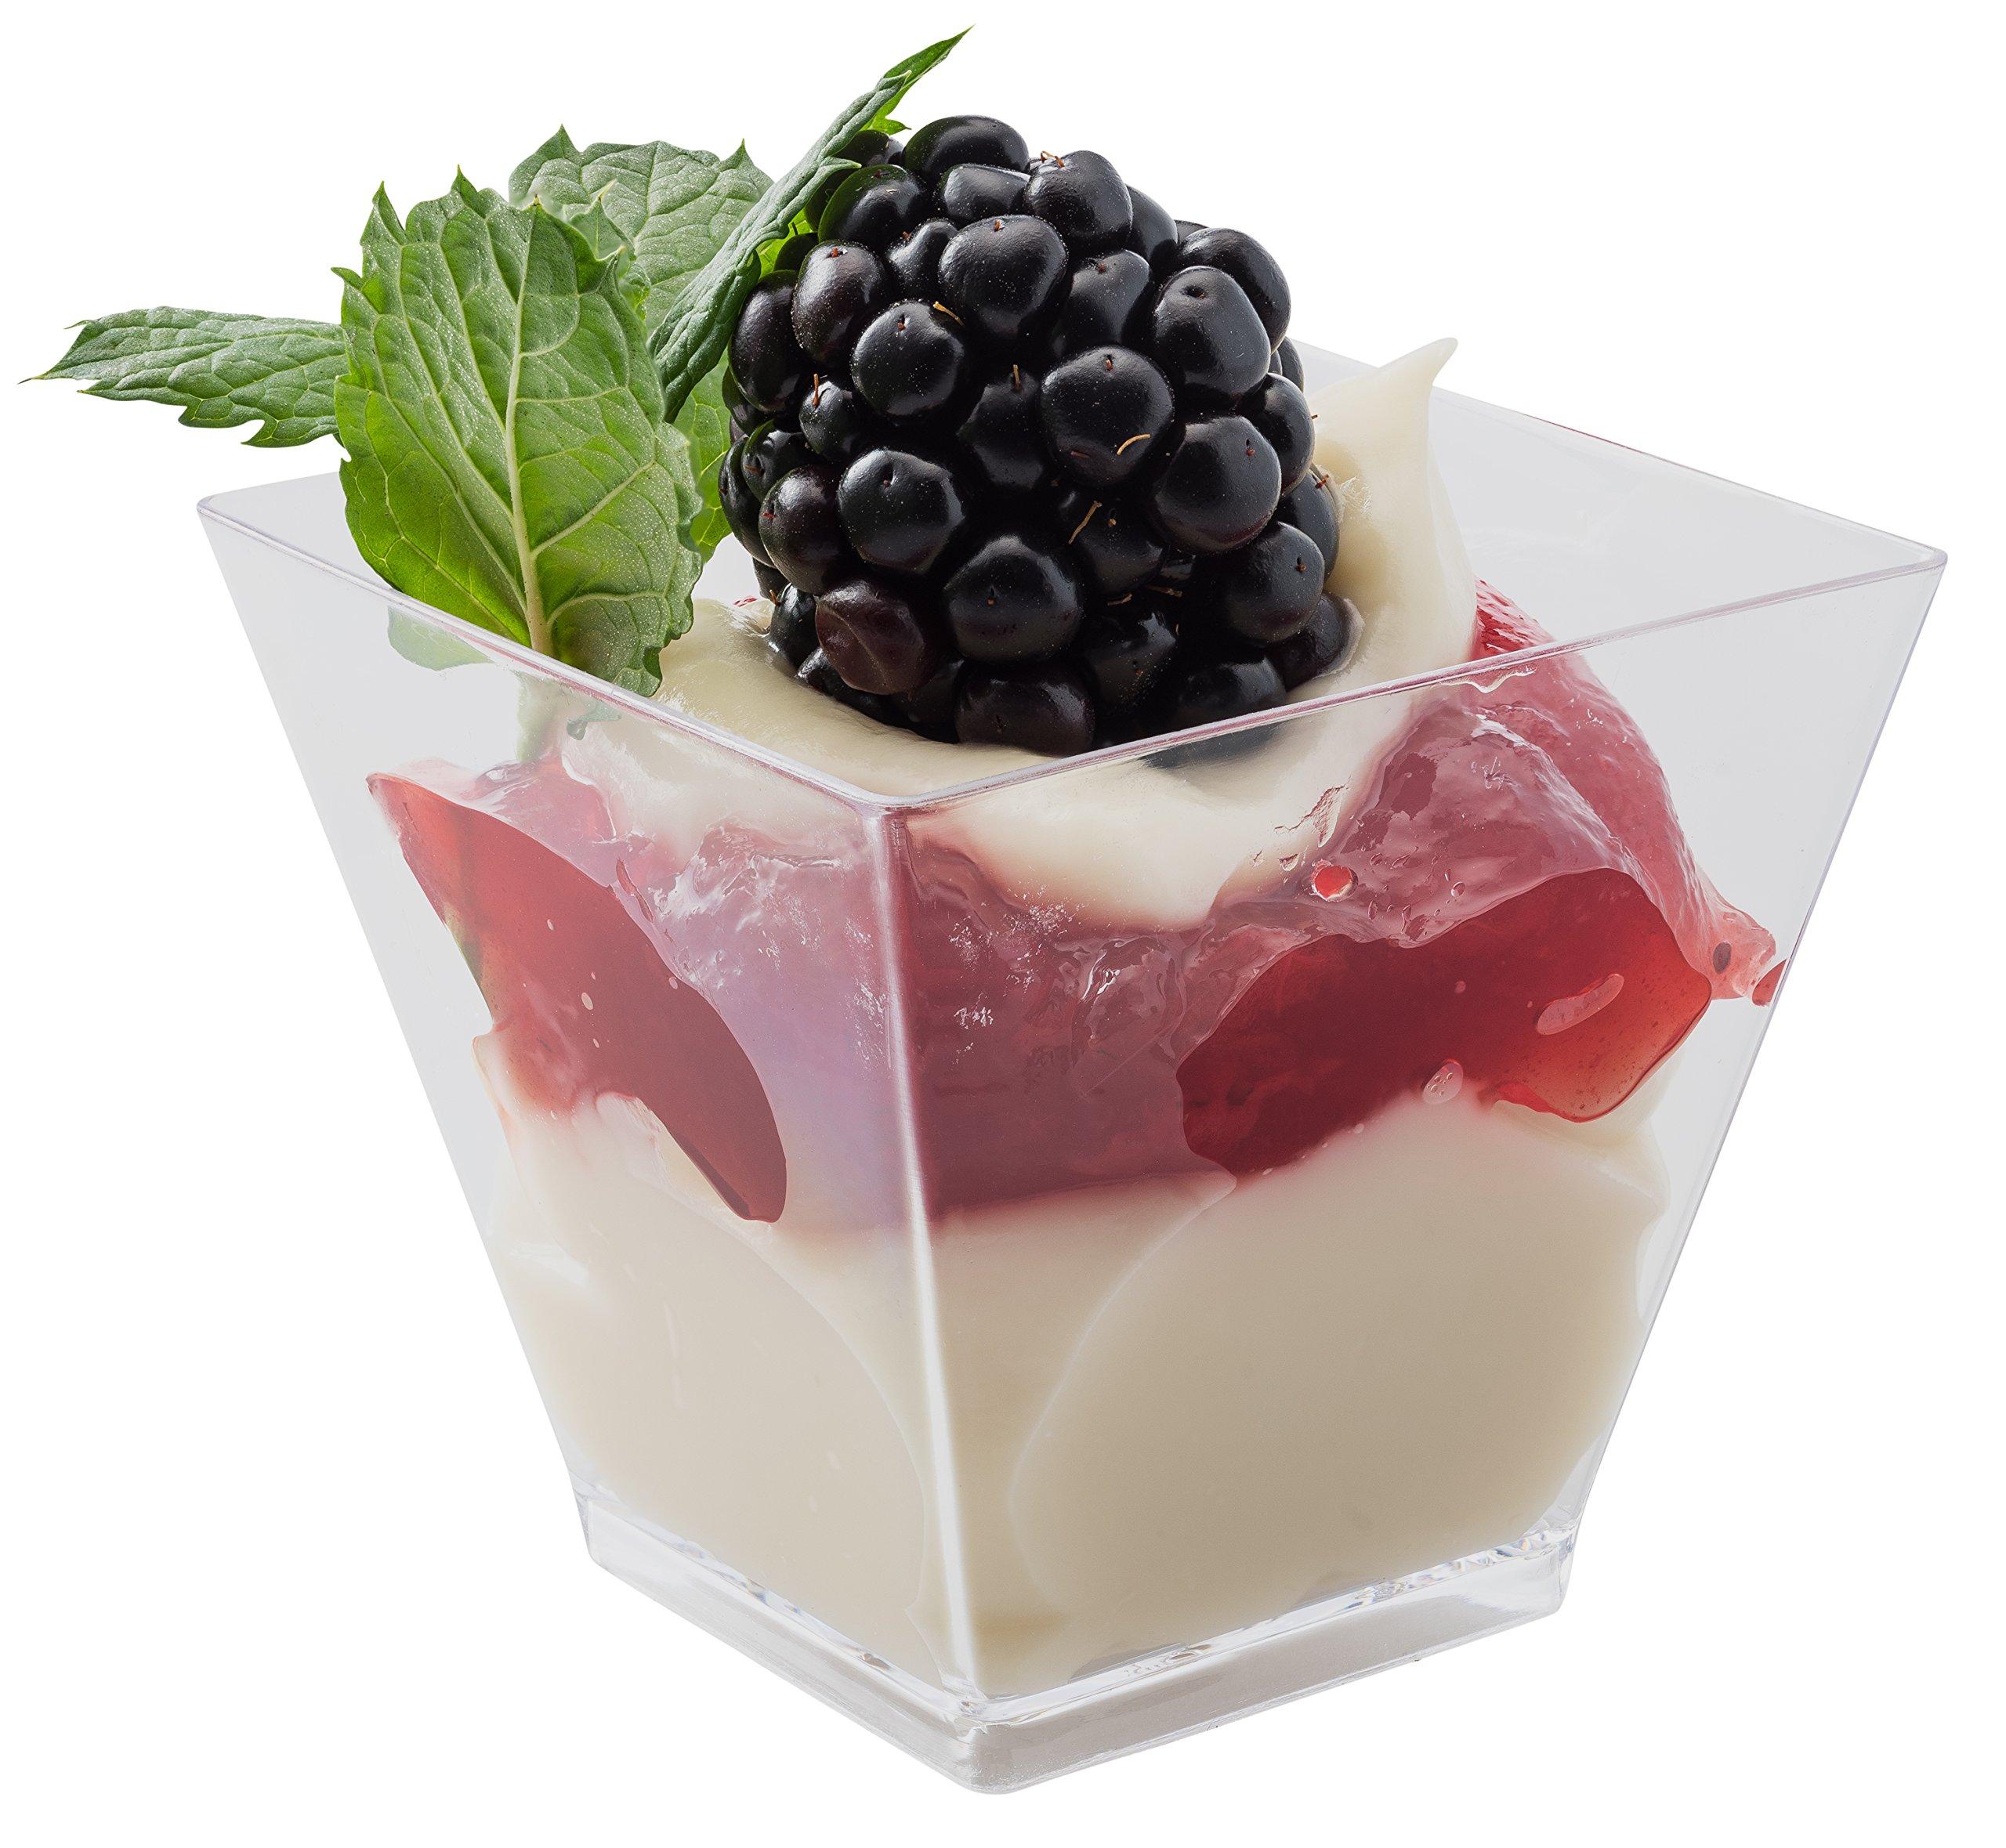 48 2oz. Plastic Clear Square Stylish Mini Dessert Cups, 2oz Shot Plastic Glasses, by Prextex